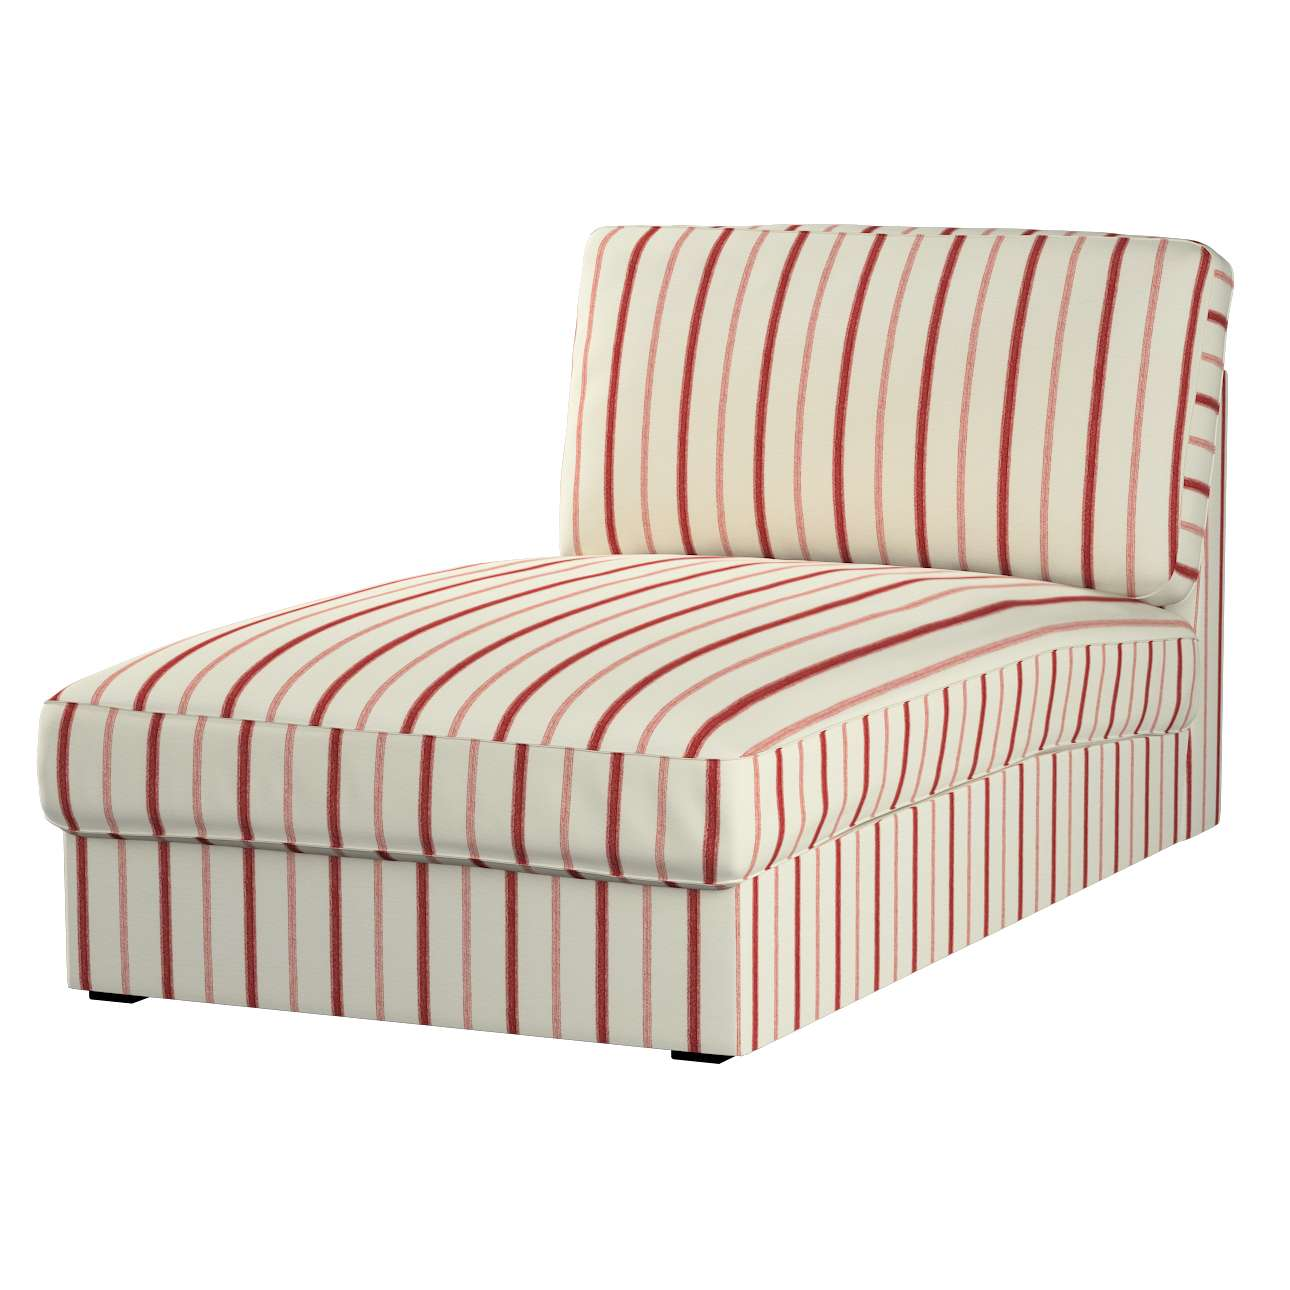 Kivik chaise longue cover Kivik chaise longue in collection Avinon, fabric: 129-15